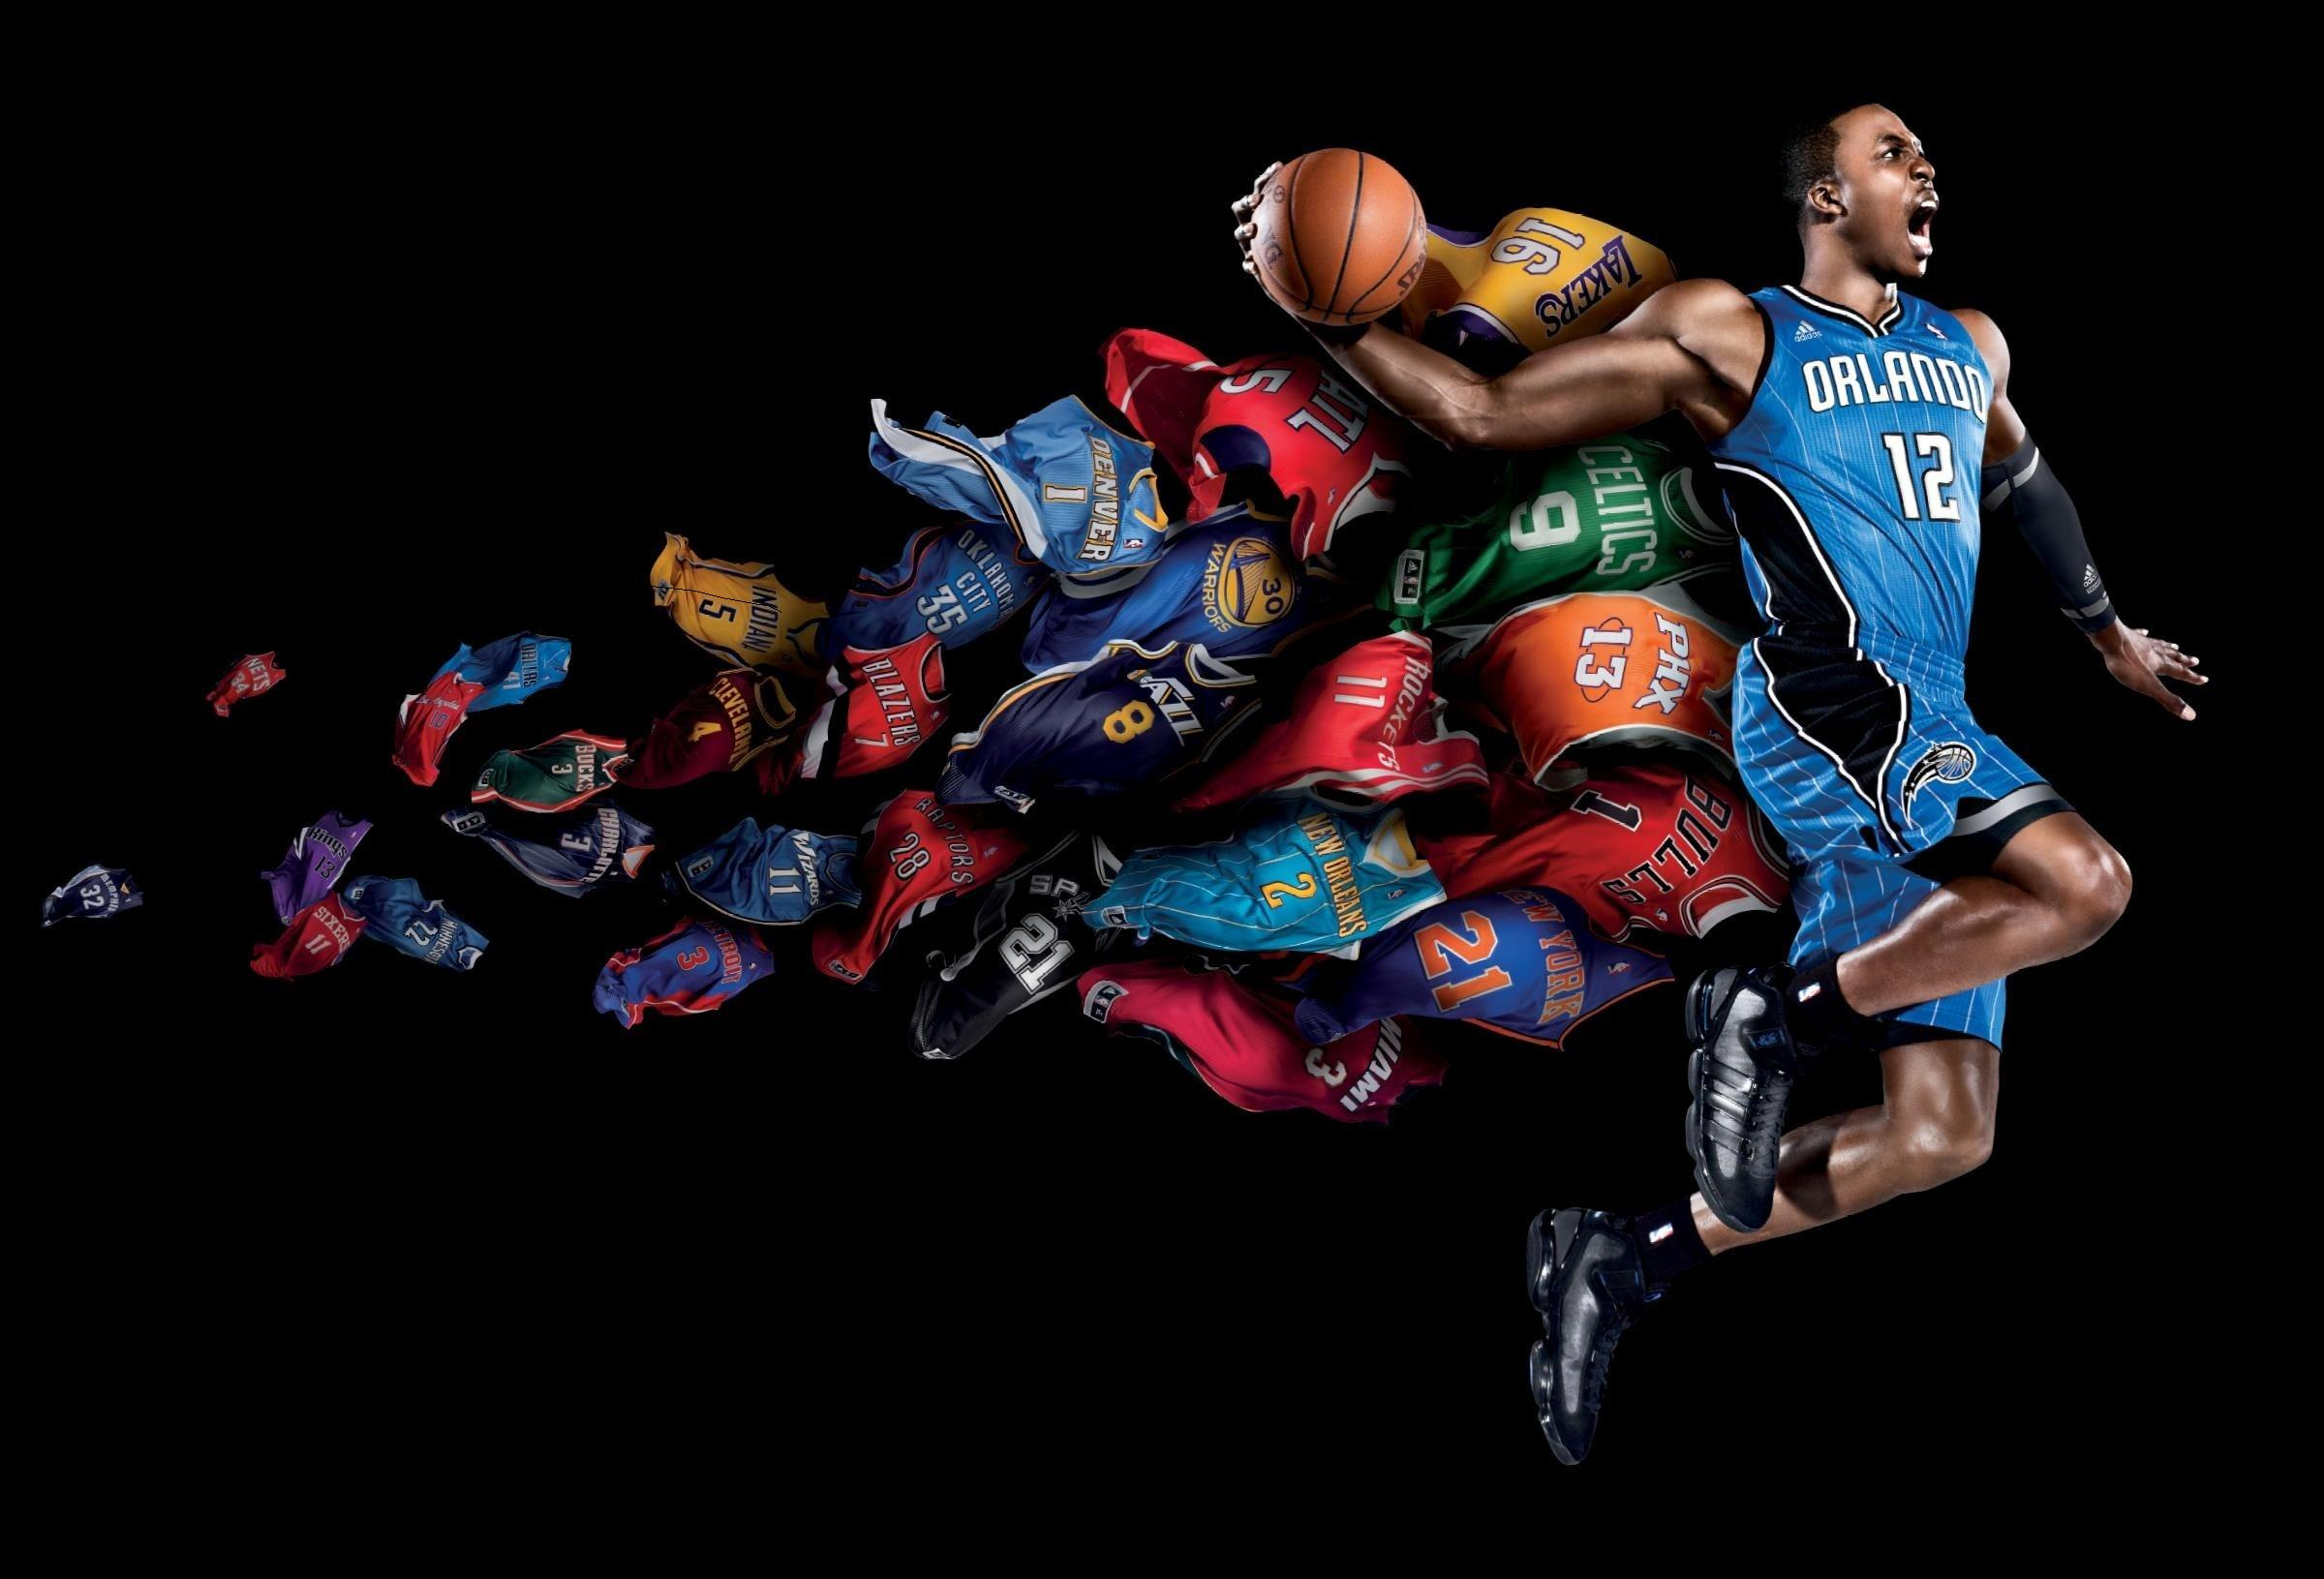 cool desktop backgrounds basketball hd wallpapers cool desktop images 2400x1631